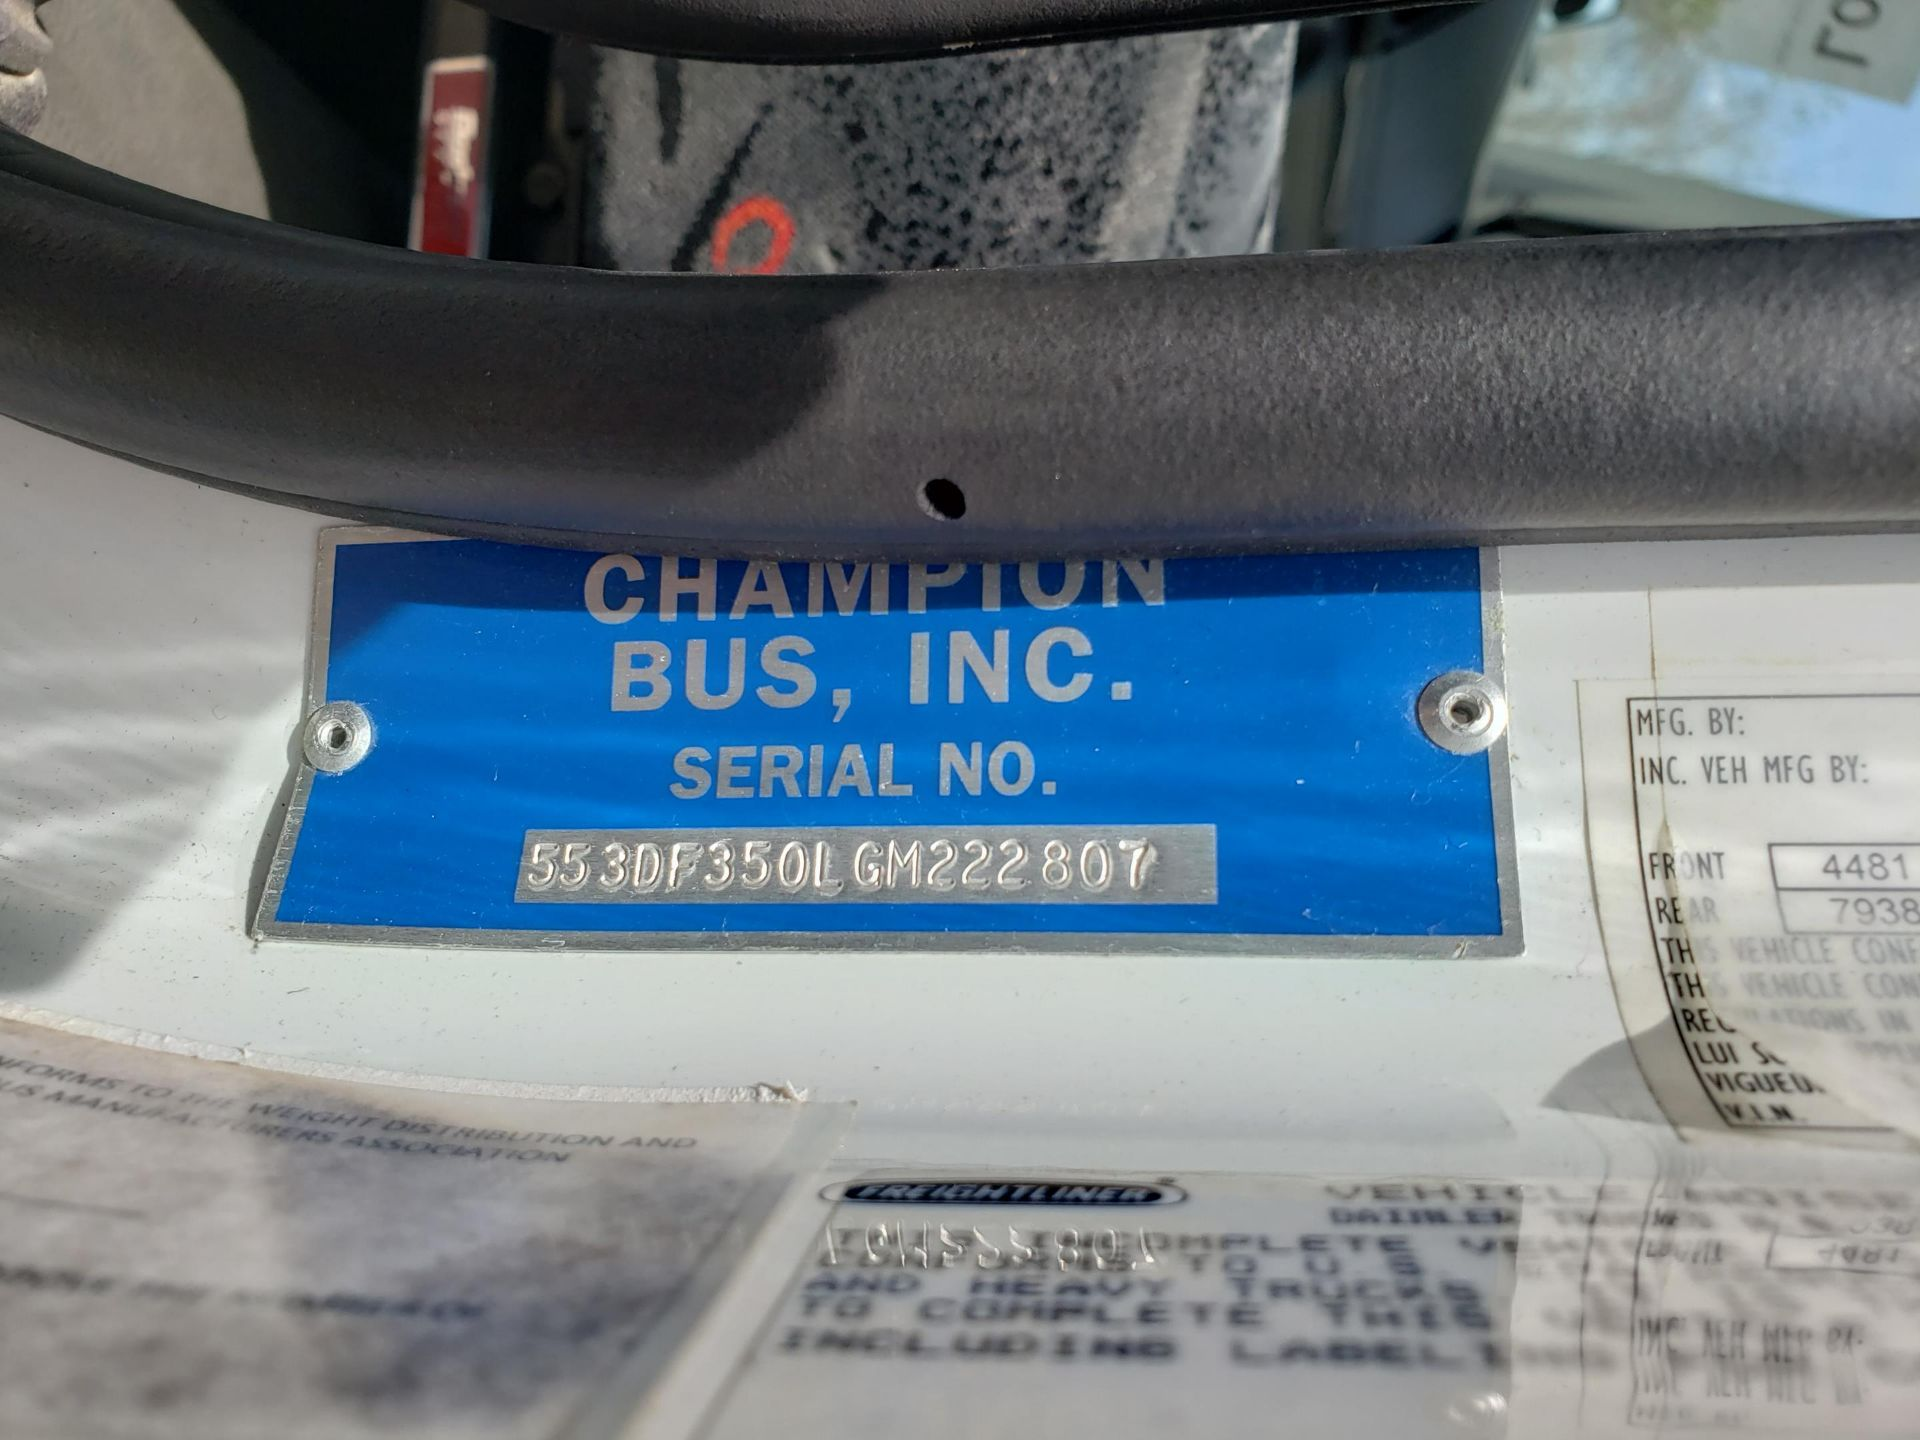 2013 Freightliner M2 106 33-Pass Champion Defender Shuttle Bus - Image 15 of 17